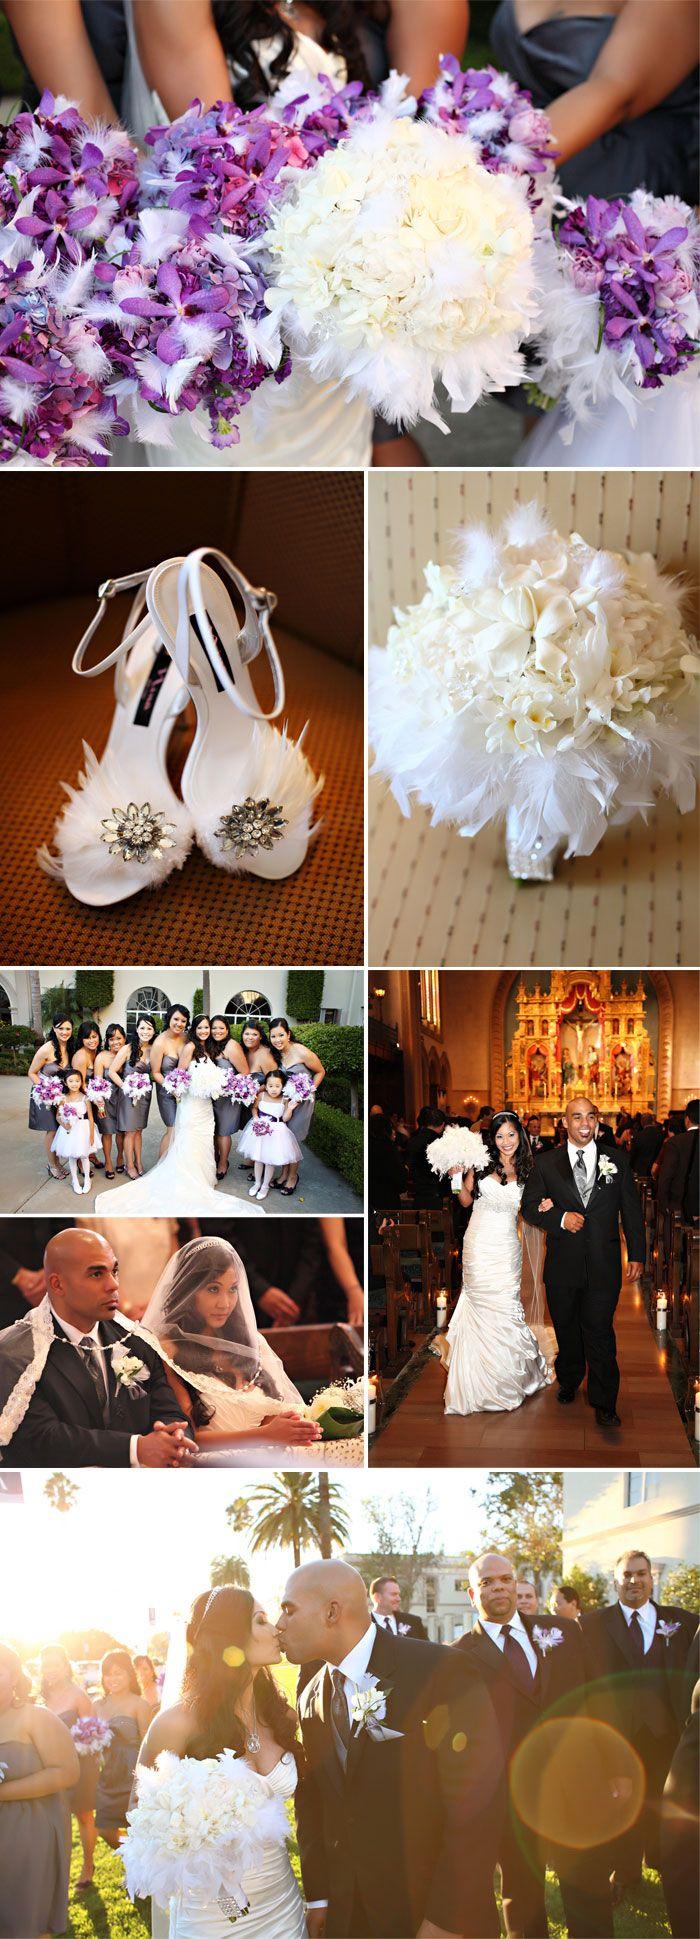 126 best PurpleGray Wedding images on Pinterest Marriage Gray